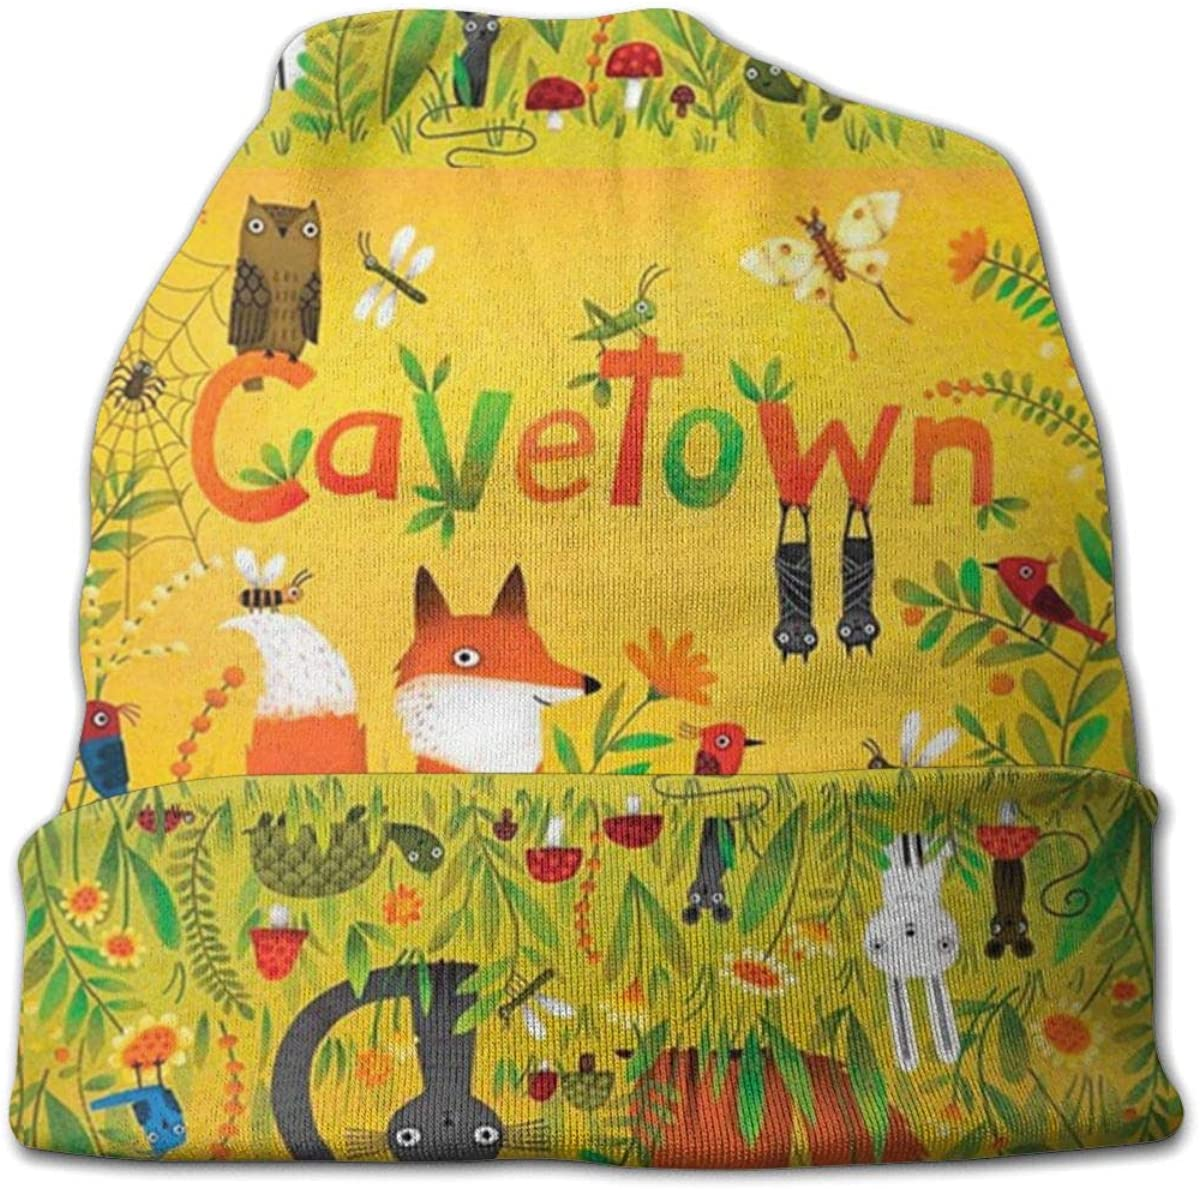 HXFCAT Cavetown Custom Beanie Hat Unisex Adult Hats Winter Warm Knit Baseball Cap Black